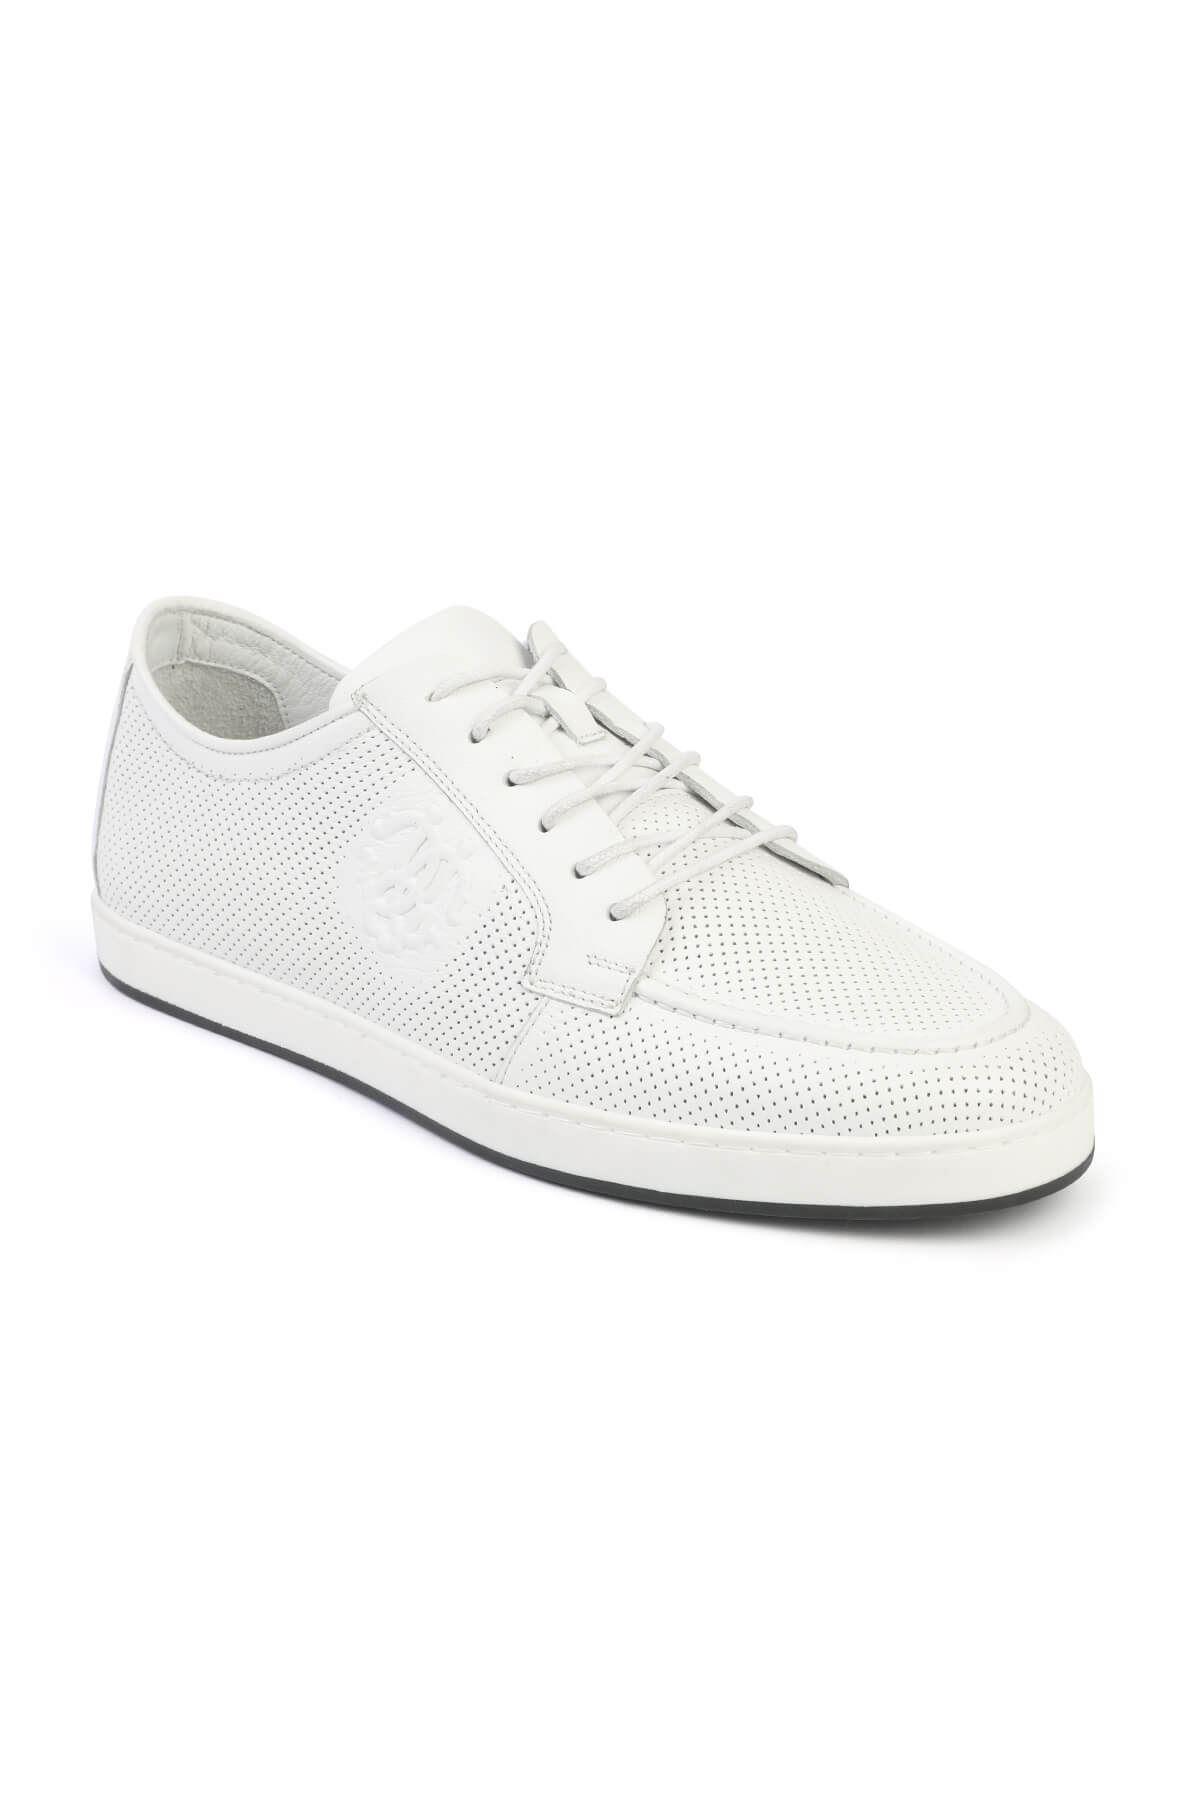 Libero 3200 White Sneaker Shoes